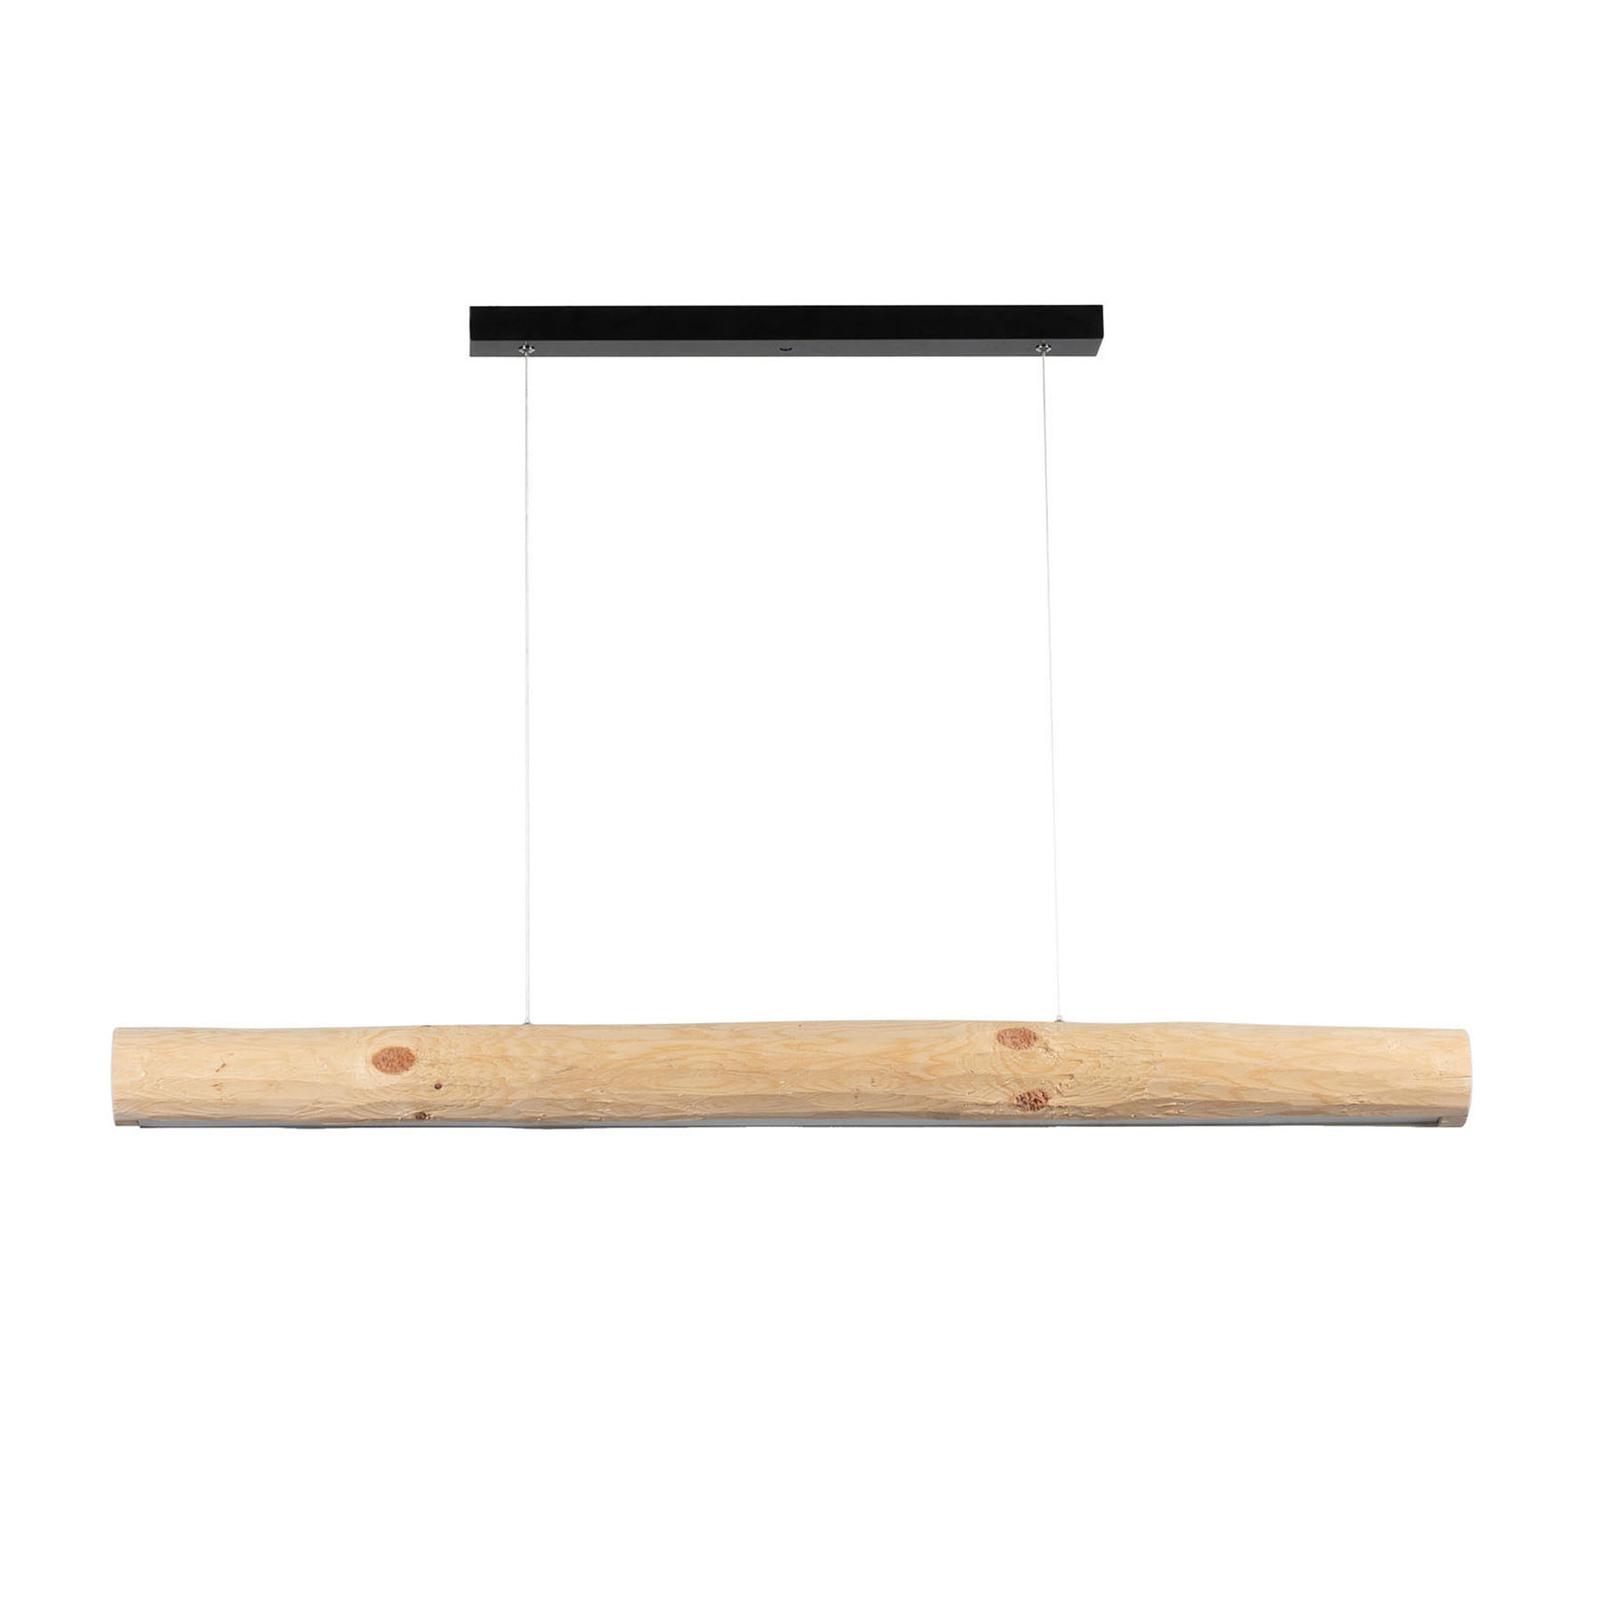 Hanglamp Lucas, dennenhout natuur, 115cm lang